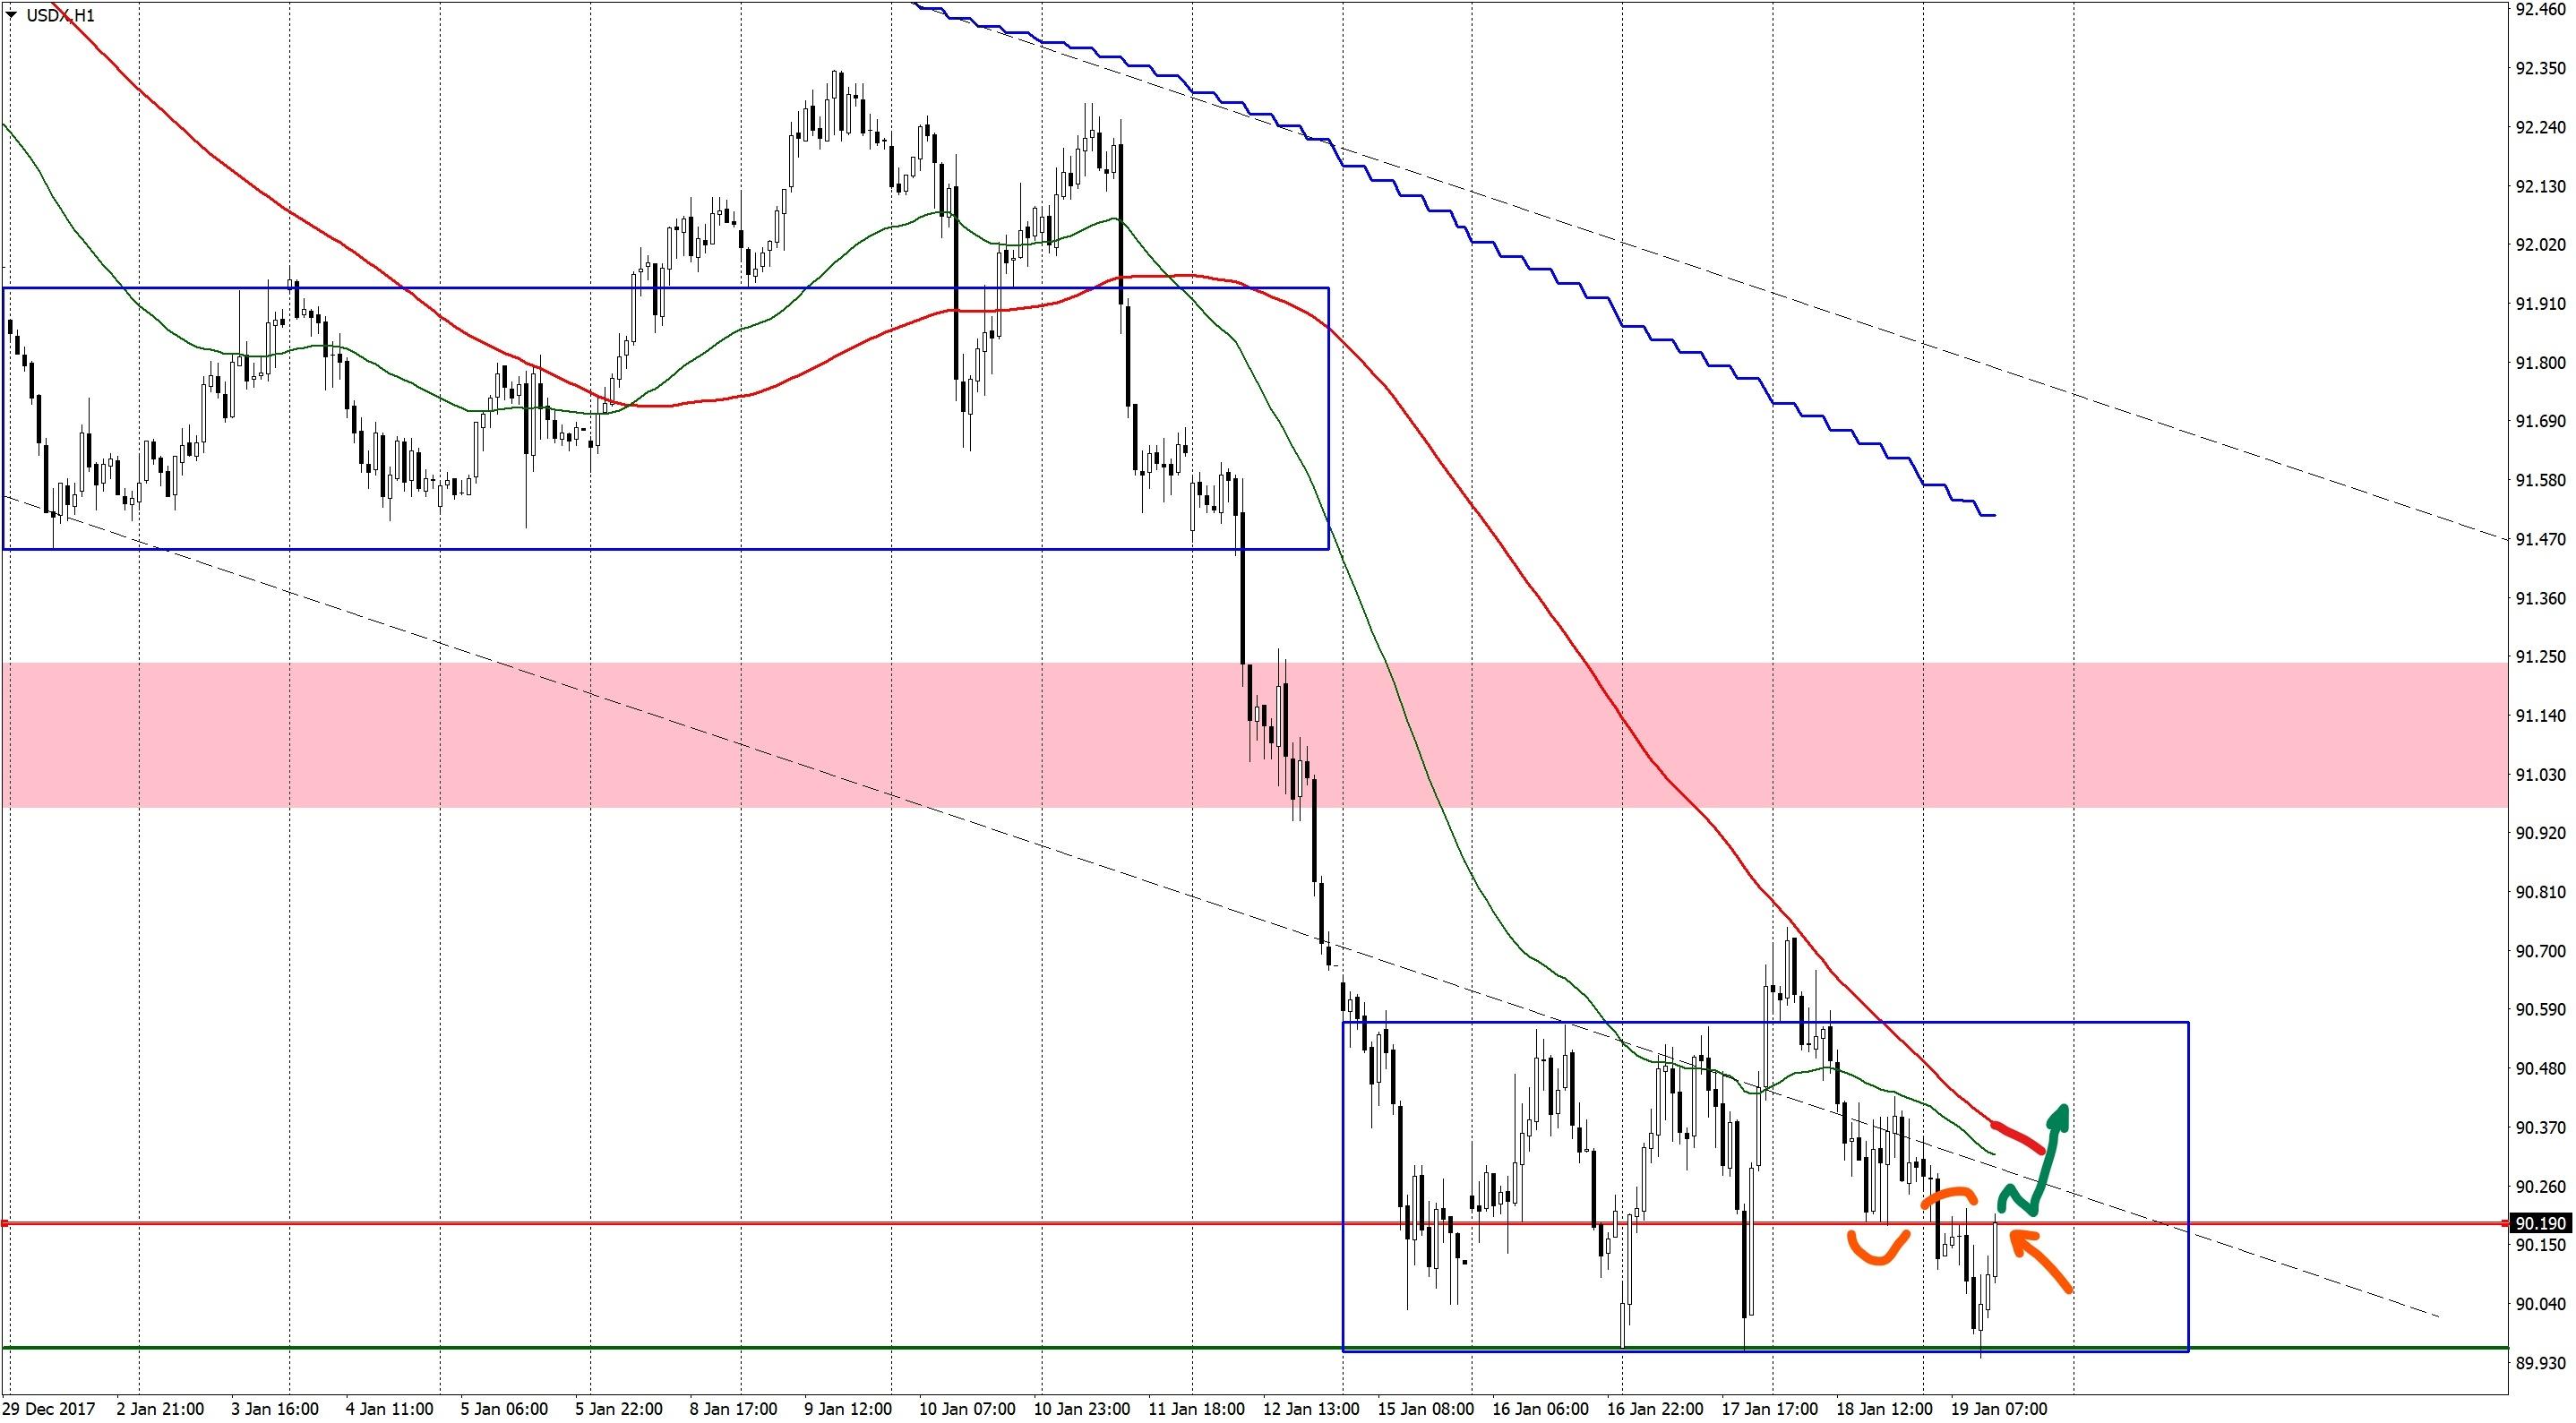 Forex dollar index